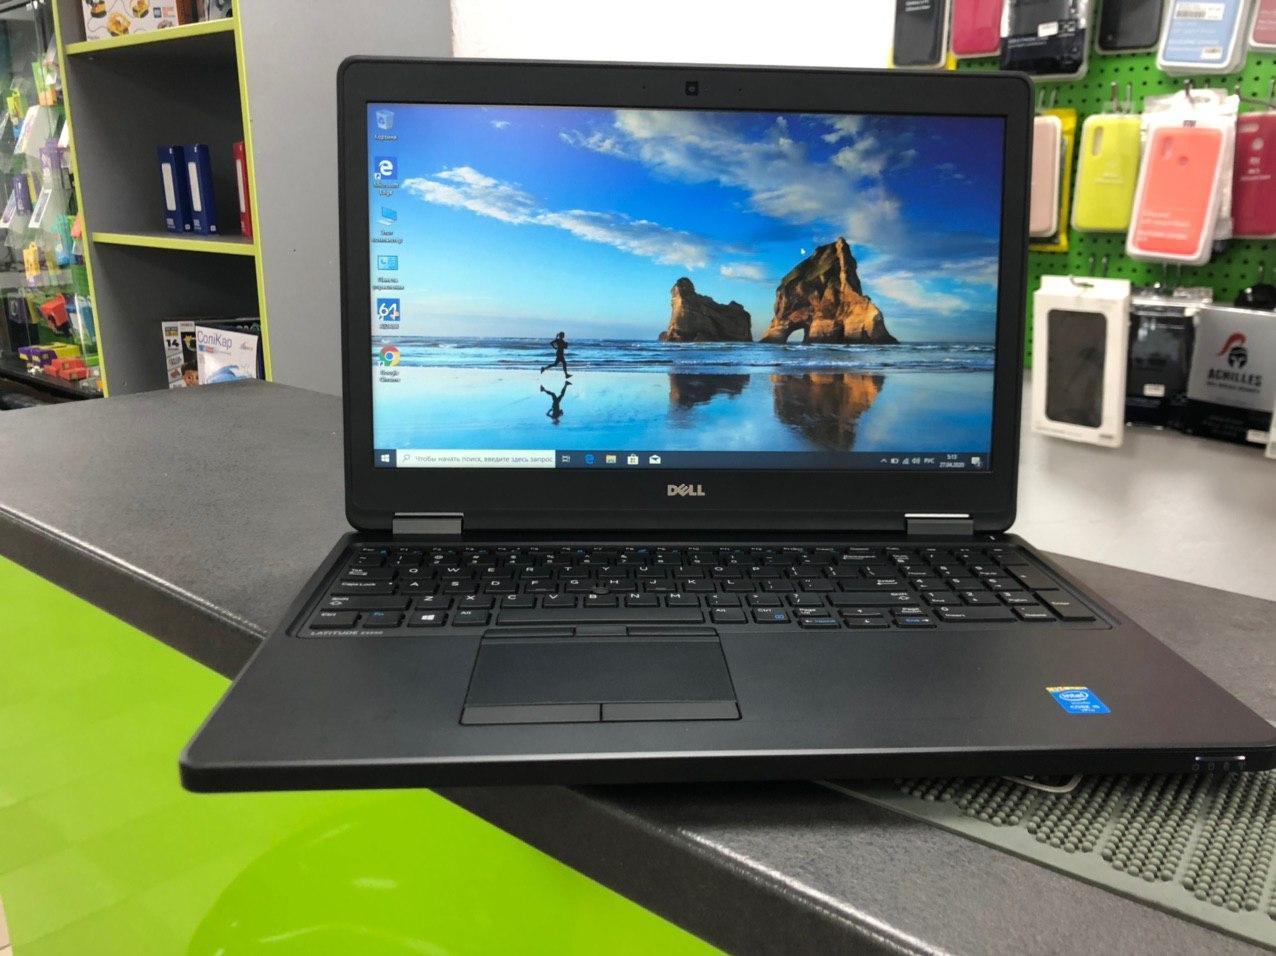 Ноутбук Dell Latitude E5550 | HD 15.6' | i5 -5300U | 8Gb | SSD 120Gb